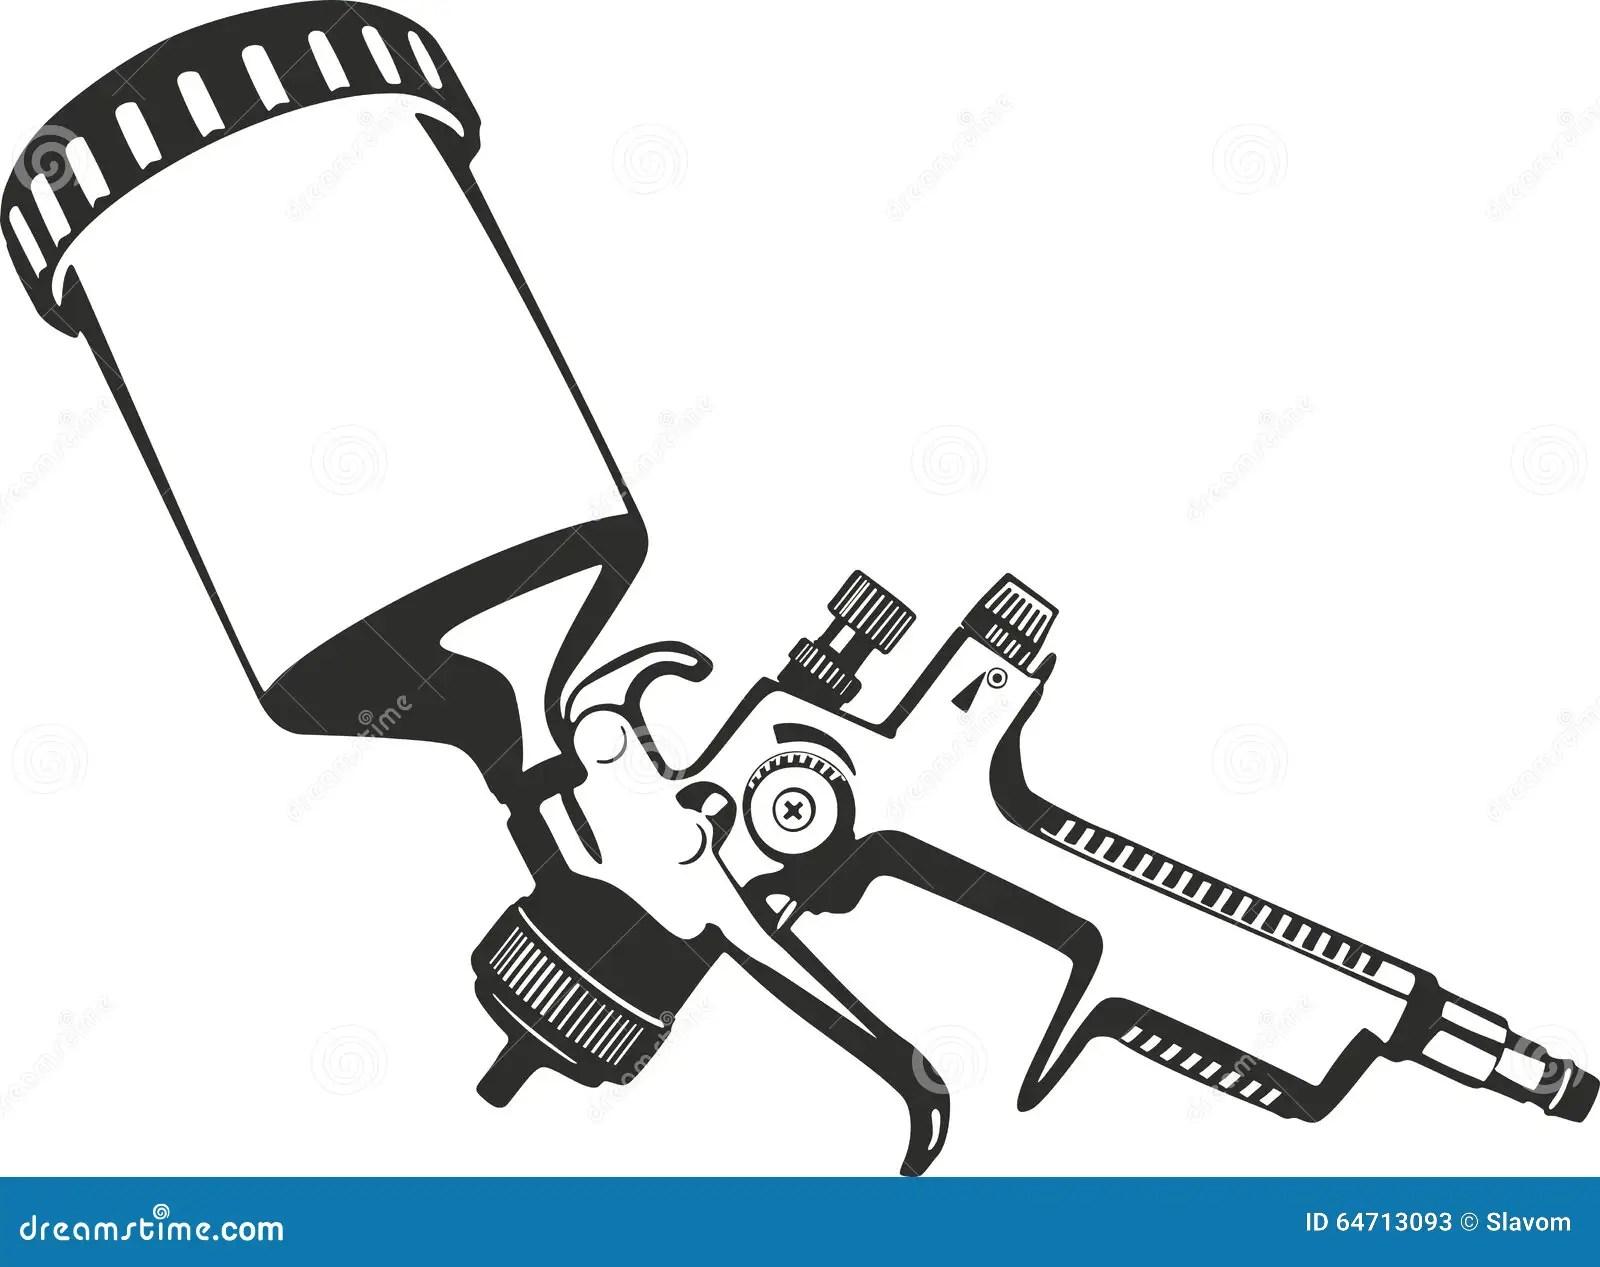 Paint Spray Gun Stock Vector Illustration Of Industry